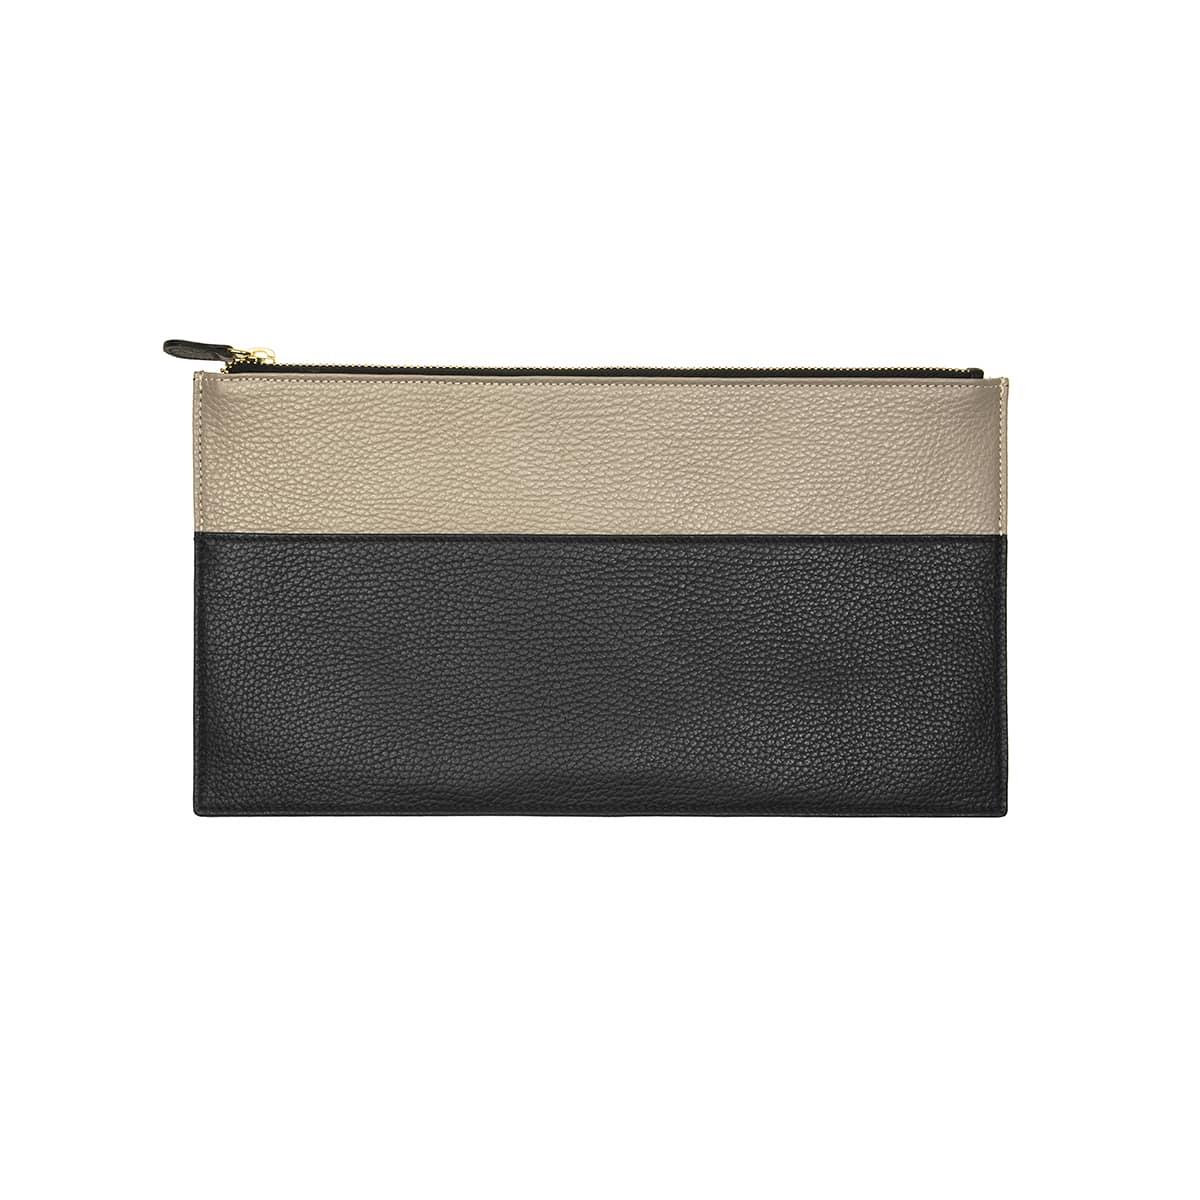 pochette plate cuir handmade coralie de seynes L'Erudite Concept Store